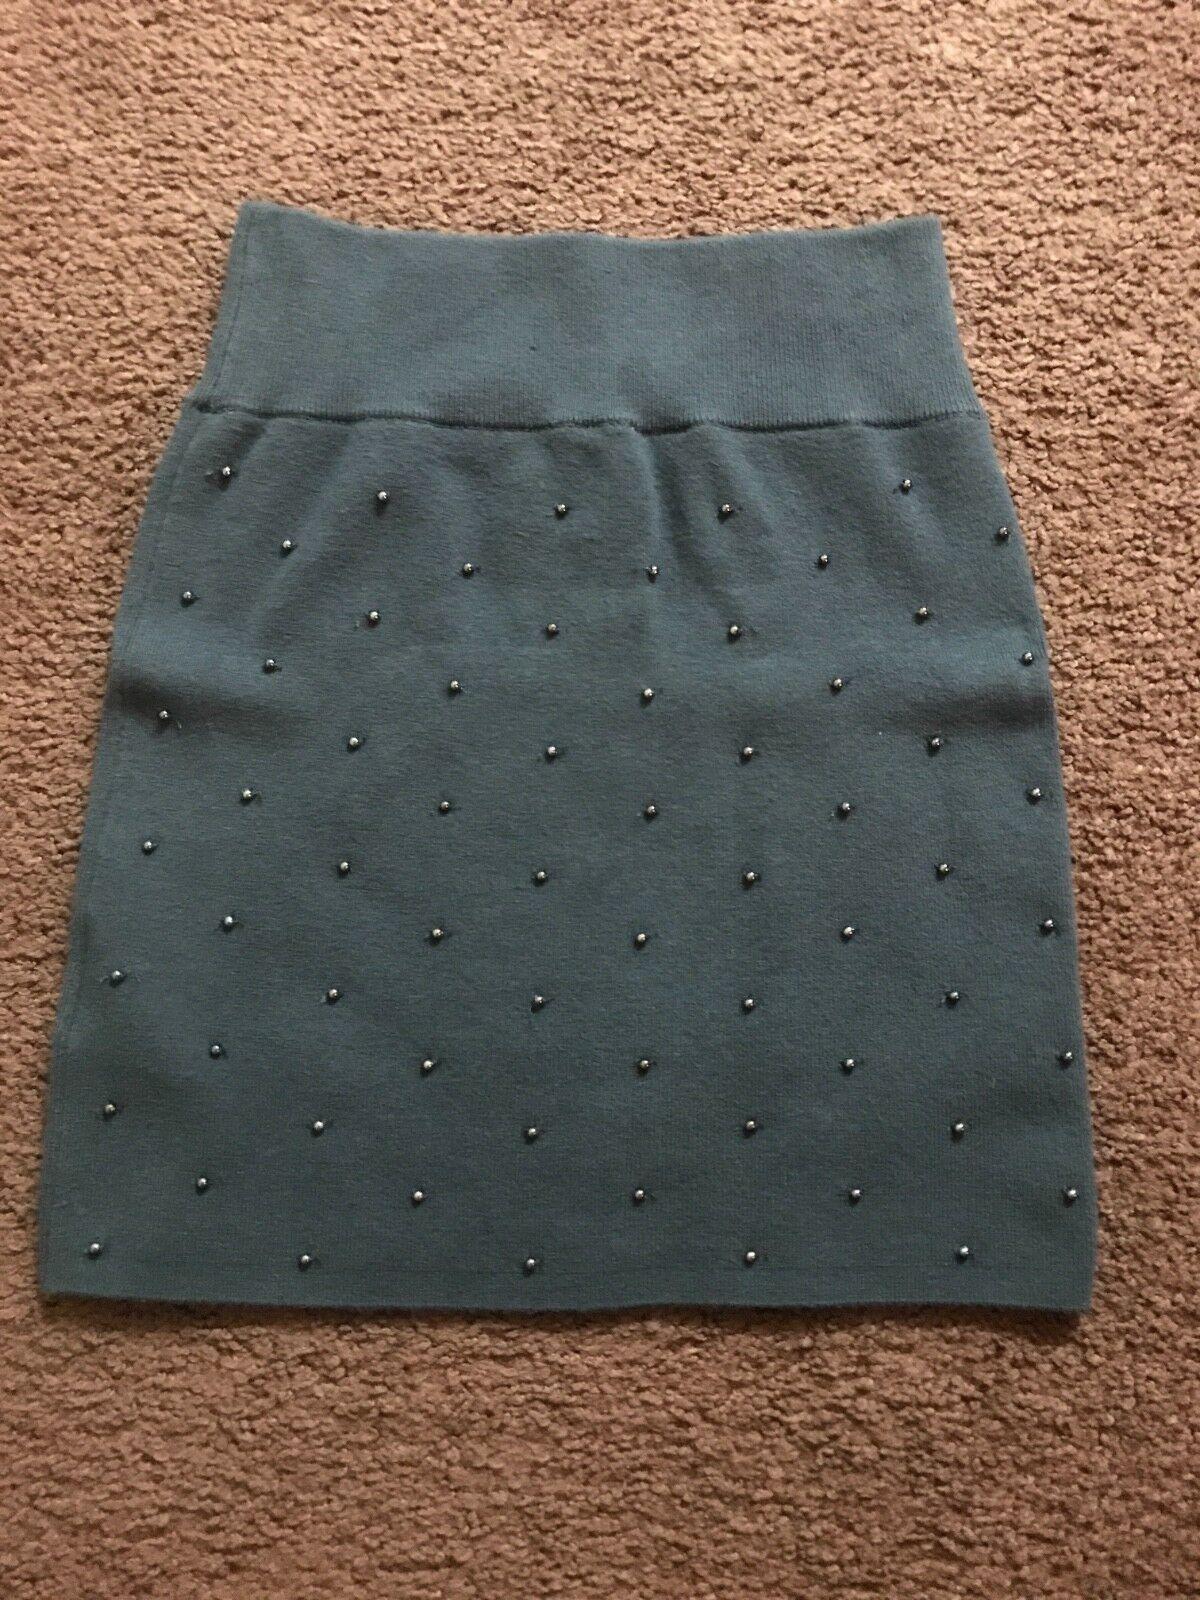 Marciano grey skirt with metallic beads Size S